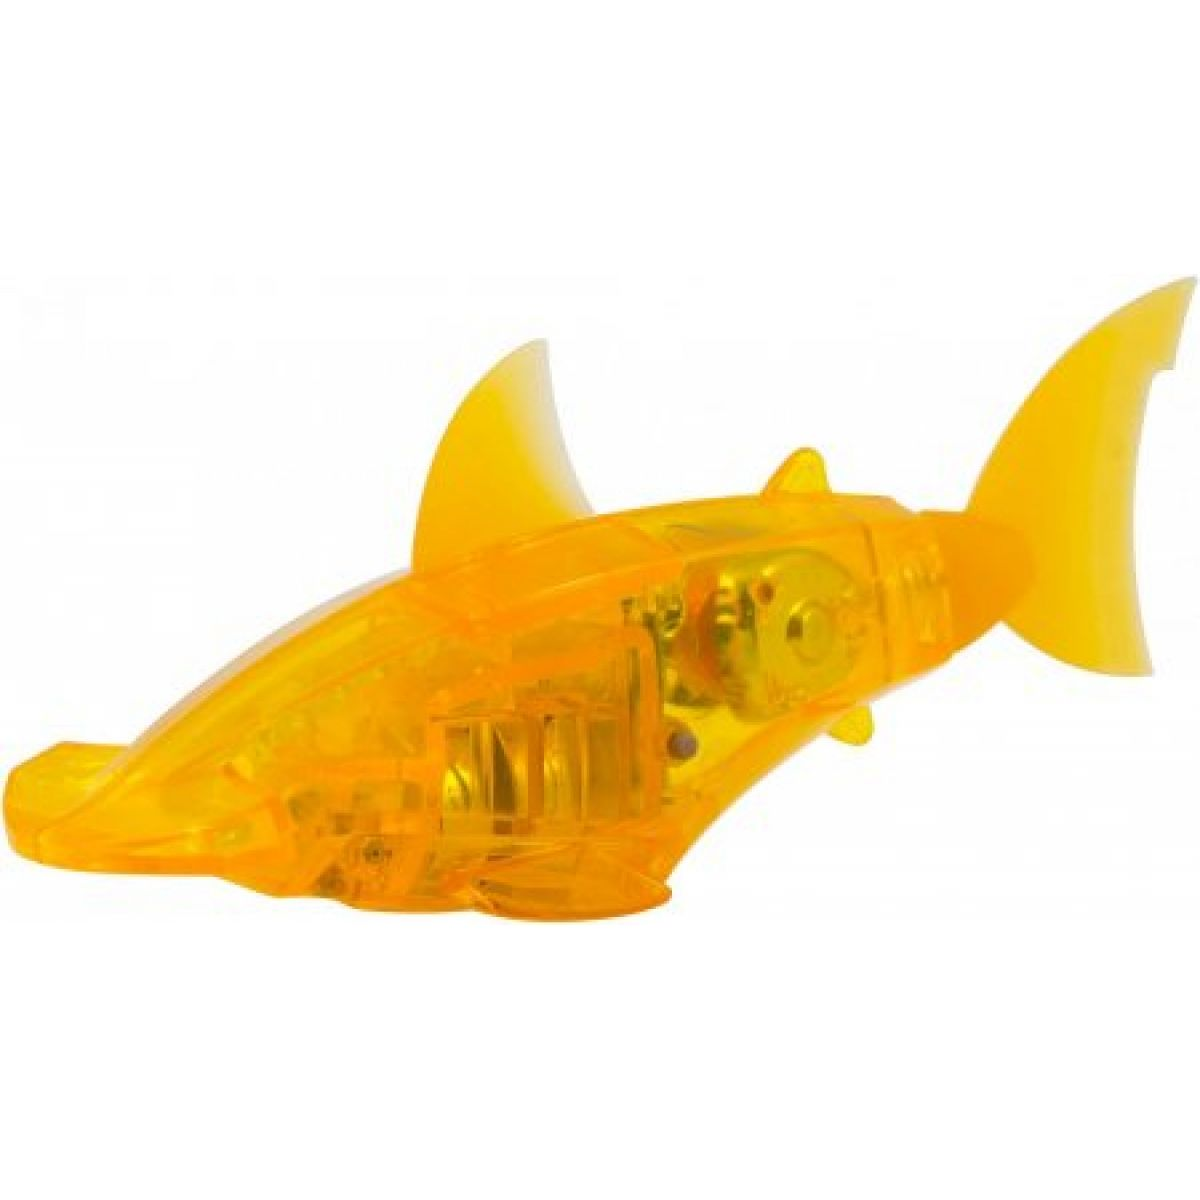 Hexbug Aquabot Led s akváriem - Kladivoun žlutý